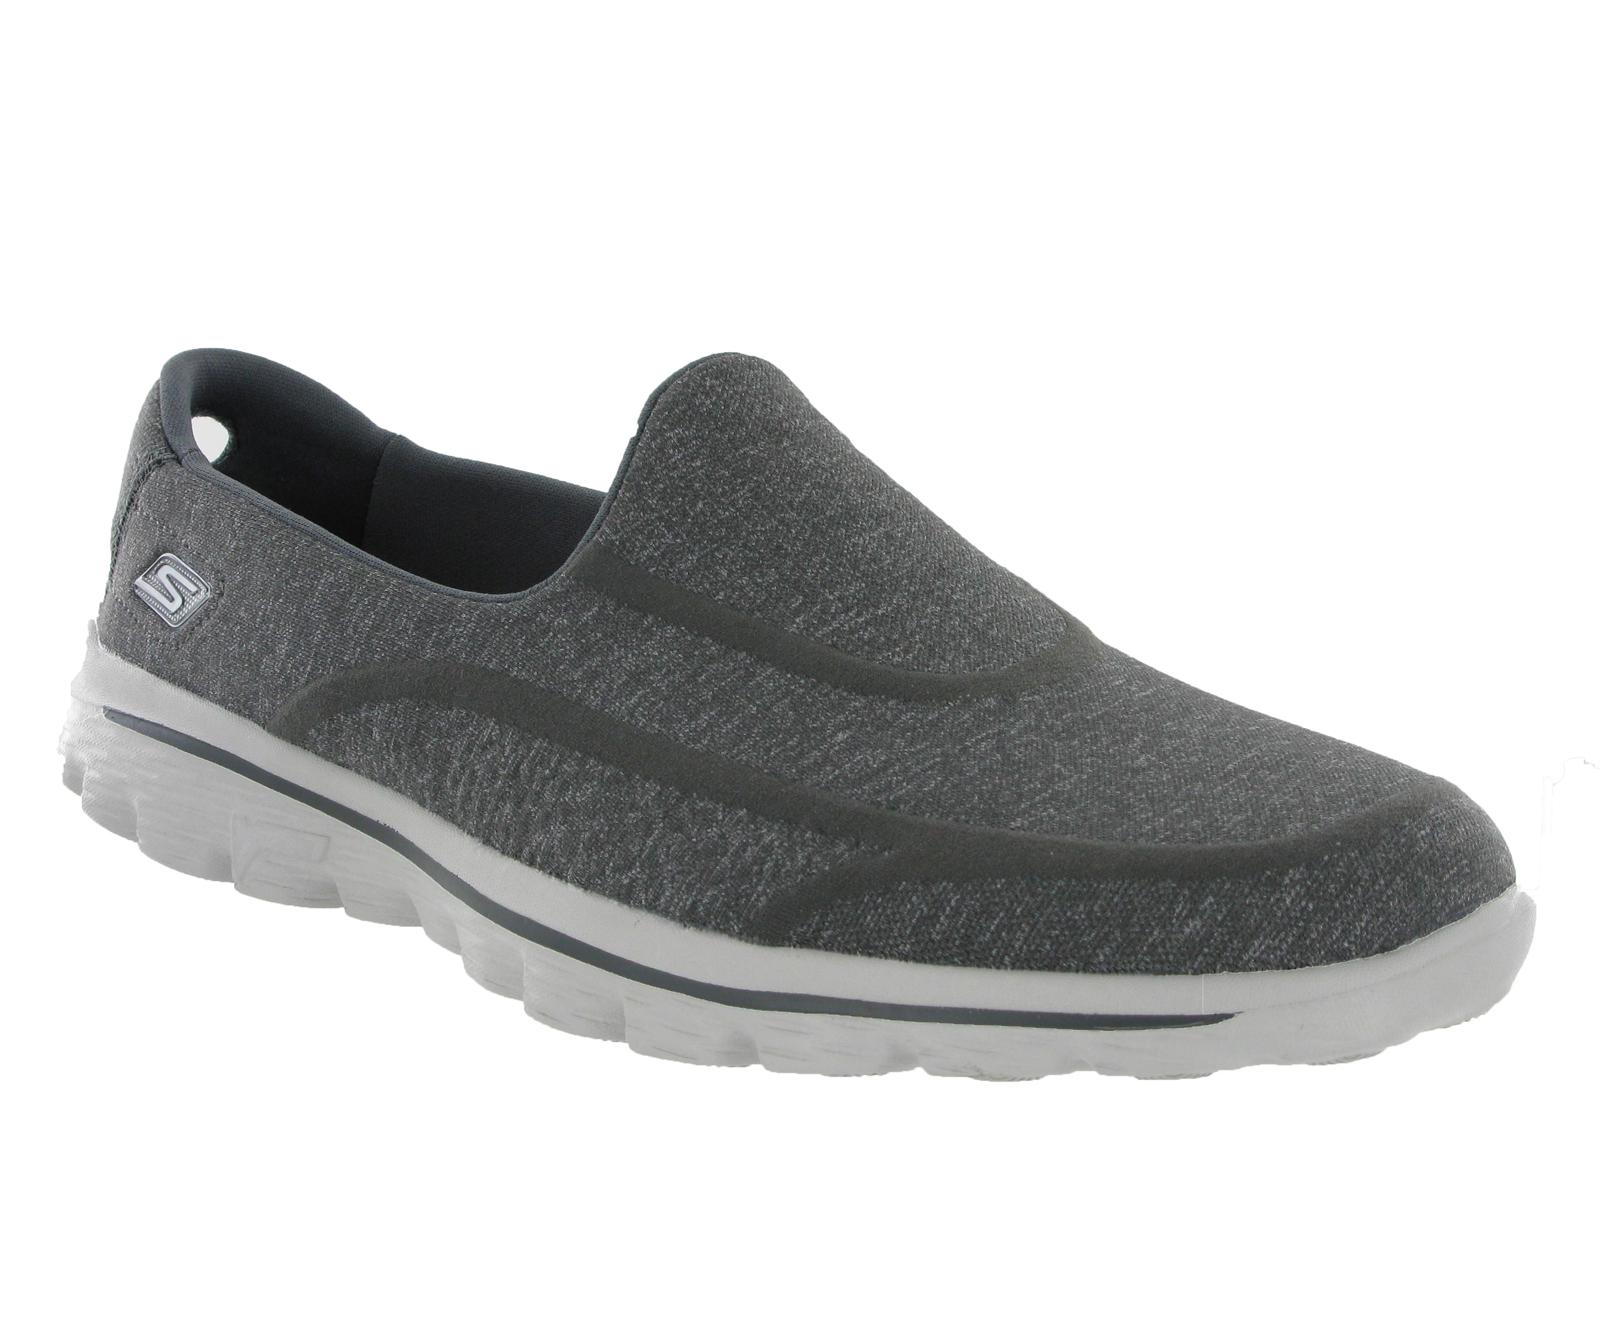 Skechers Super Para Camiseta 2 Mujer Sock Nueva Go Walk Bombas 0HBtTwq